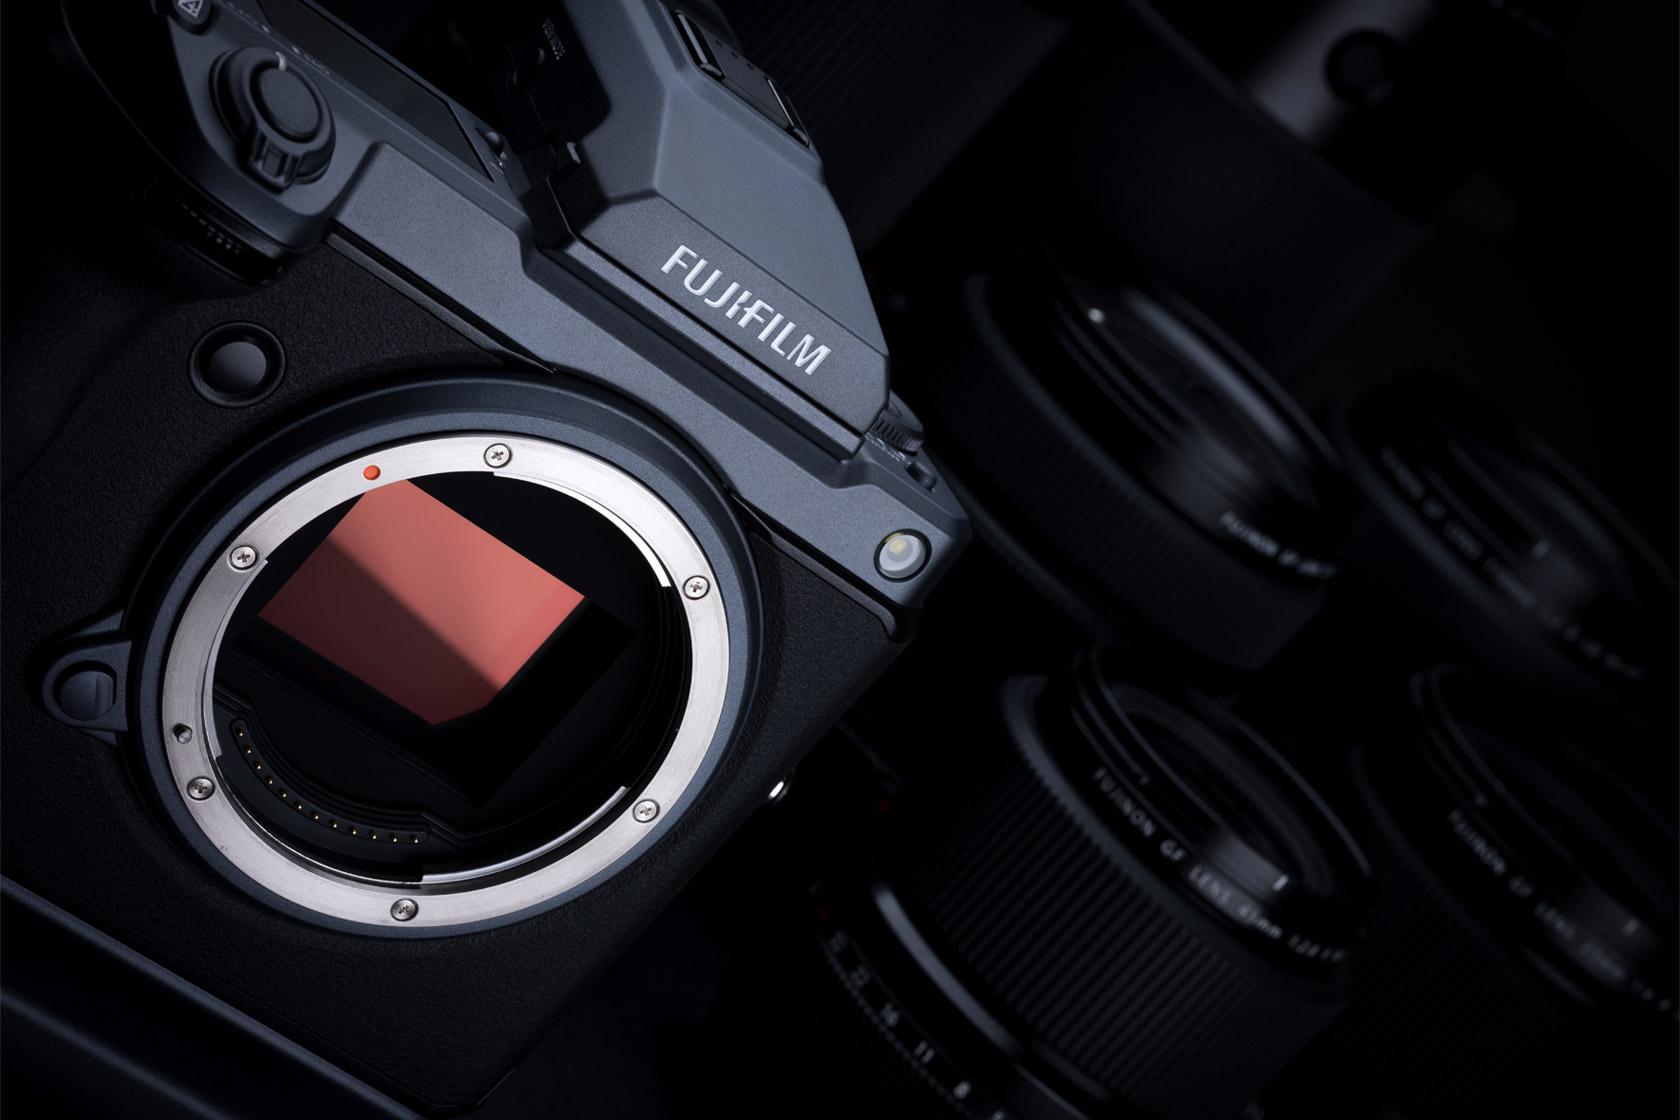 [ph[ภาพ] ตัวกล้องดิจิทัลระบบ GFX ของ Fujifilm อยู่ติดกับเลนส์ที่จัดเรียงไว้